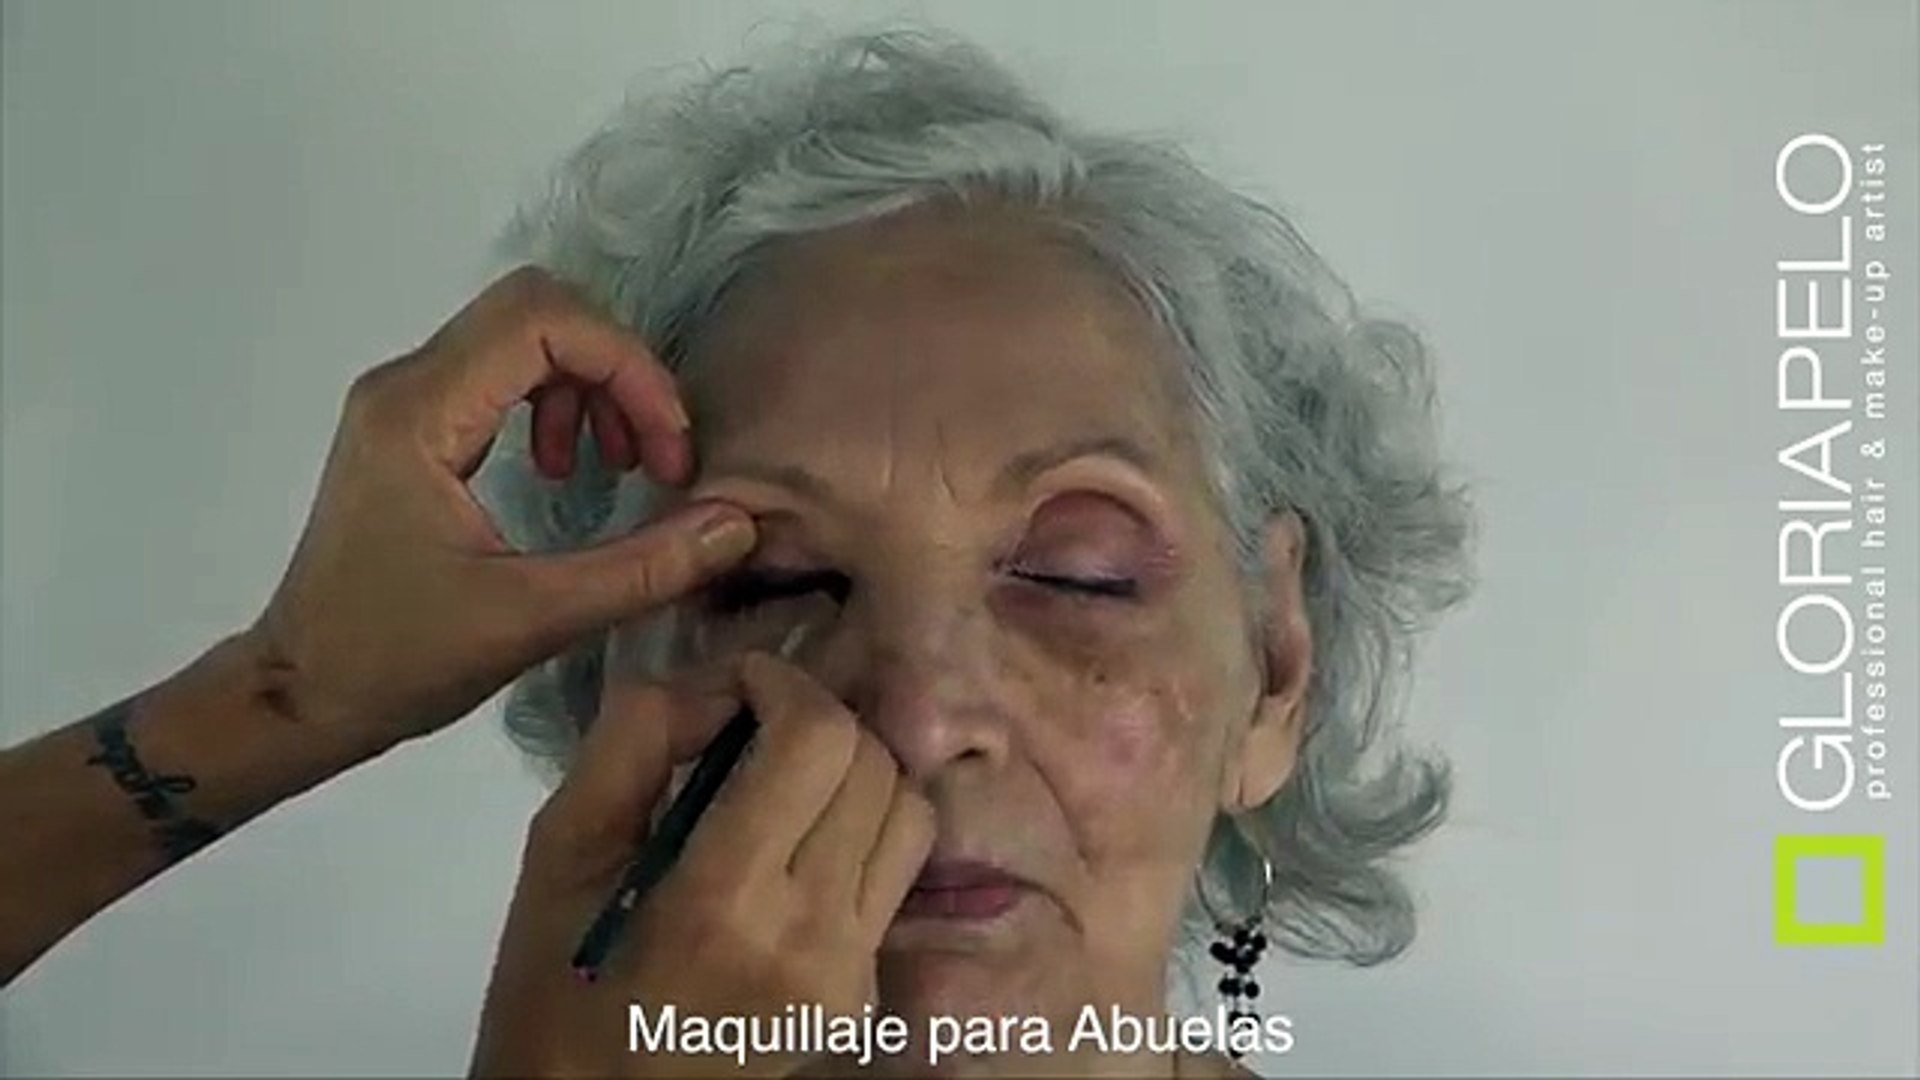 Abuelas Maduras maquillaje para abuelas piel madura